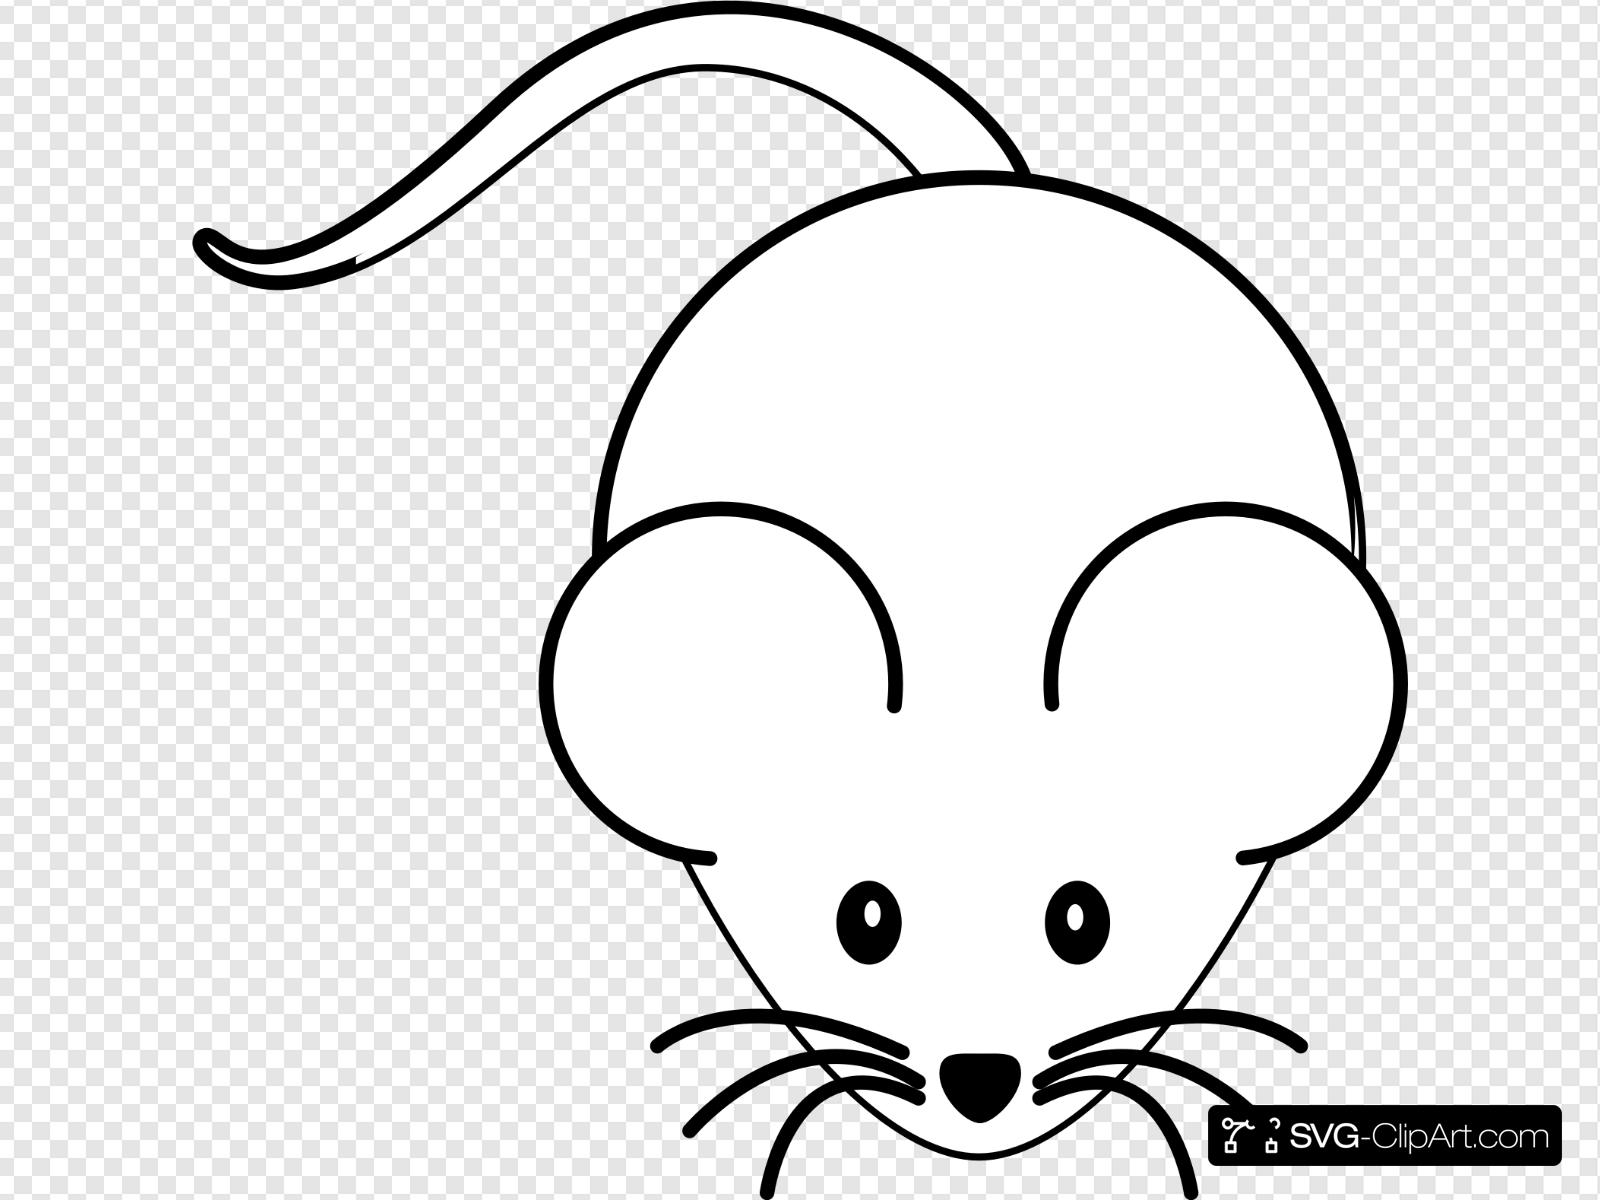 White mouse clipart png svg transparent download Black And White Mouse Clip art, Icon and SVG - SVG Clipart svg transparent download